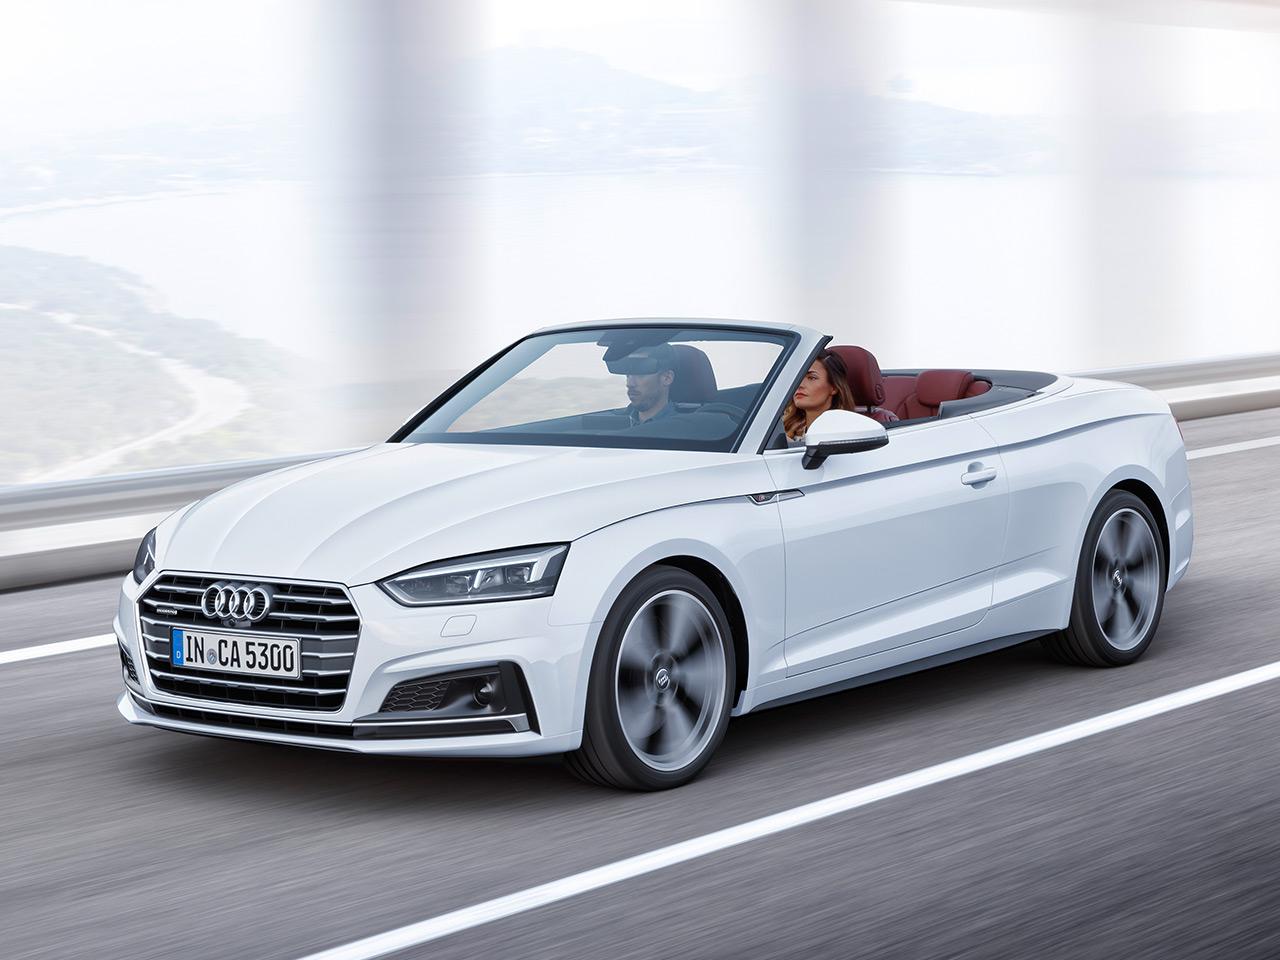 Audi A5 Cabrio (2017): Preis | autozeitung.de